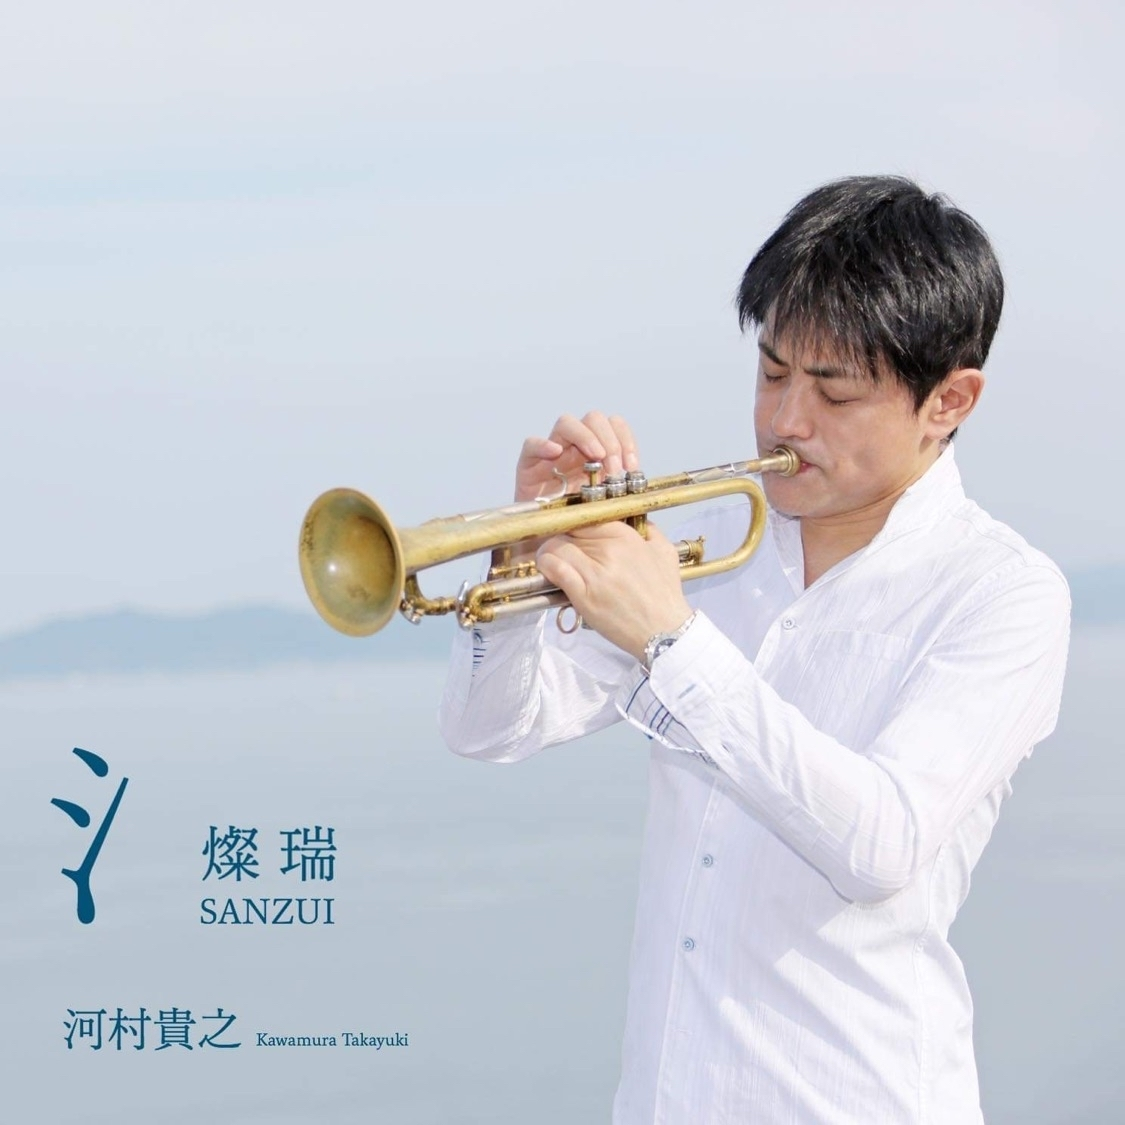 Jazzlive Comin ジャズライブカミン 広島 本日12月9日の演目_b0115606_10445252.jpeg